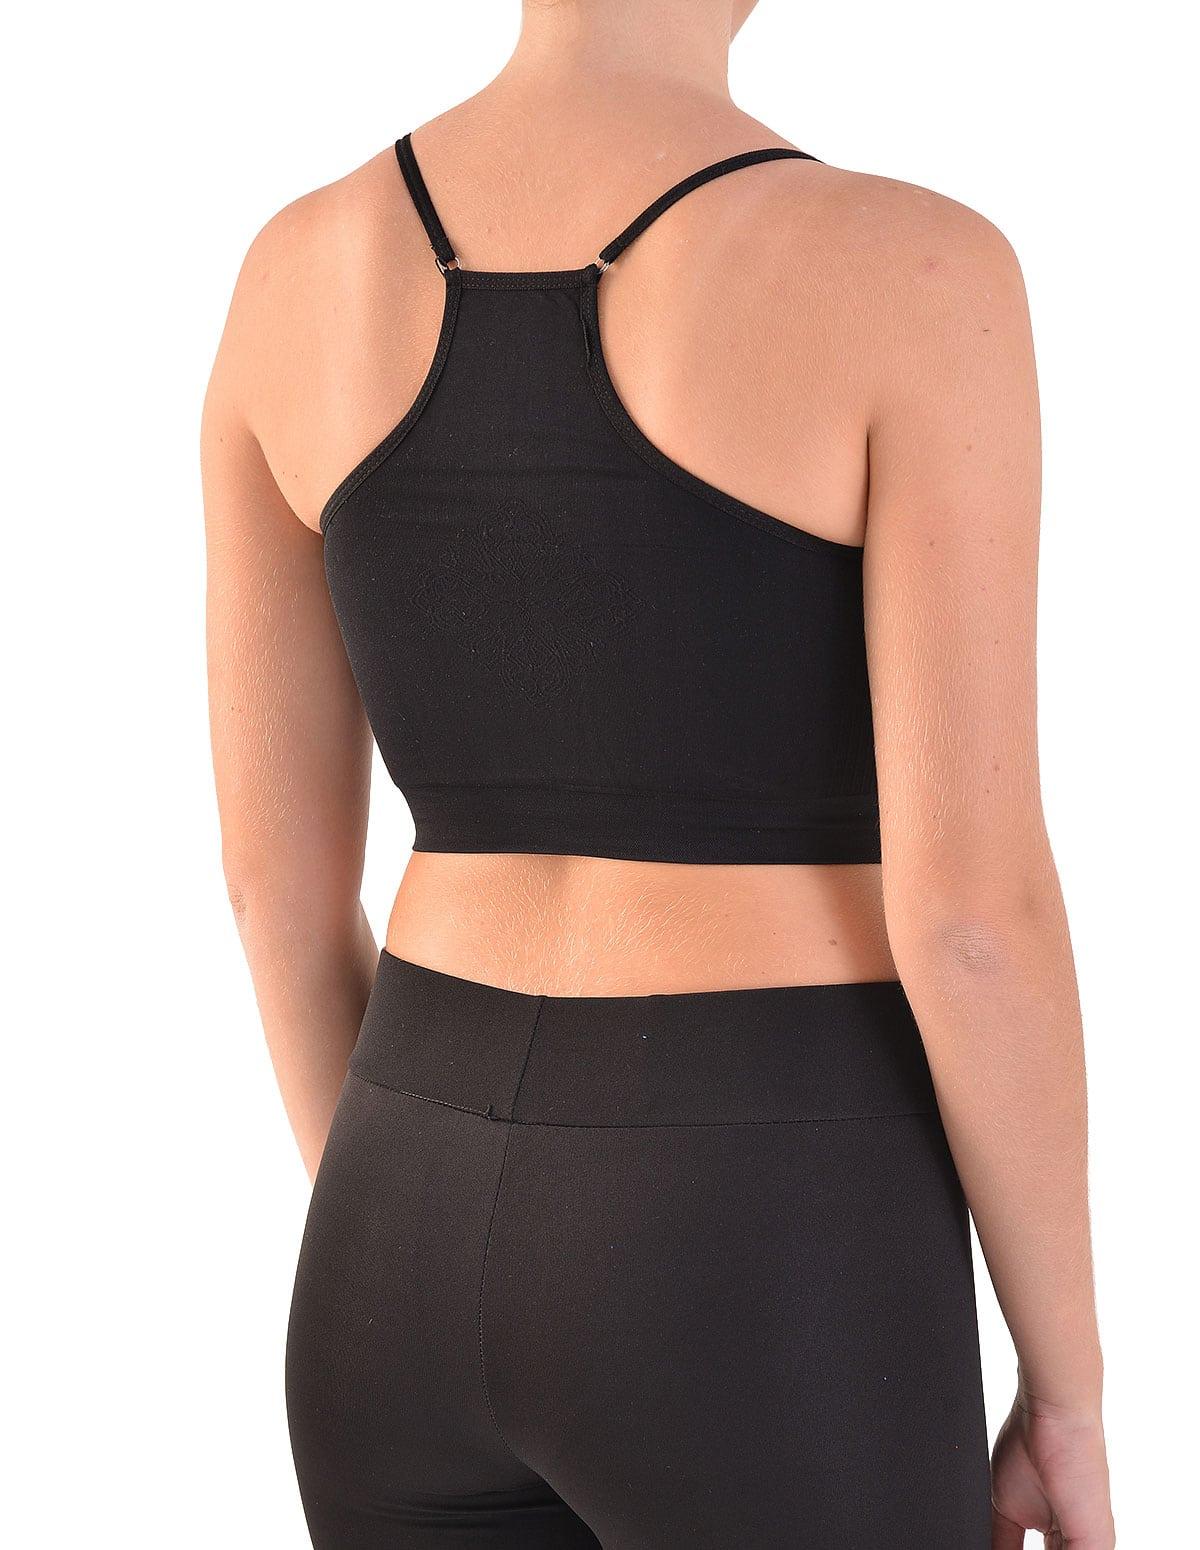 Home Γυναικεία Μπουστάκια Αθλητικά Γυναικείο αθλητικό μπουστάκι σε μαύρο  χρώμα 13f23117857